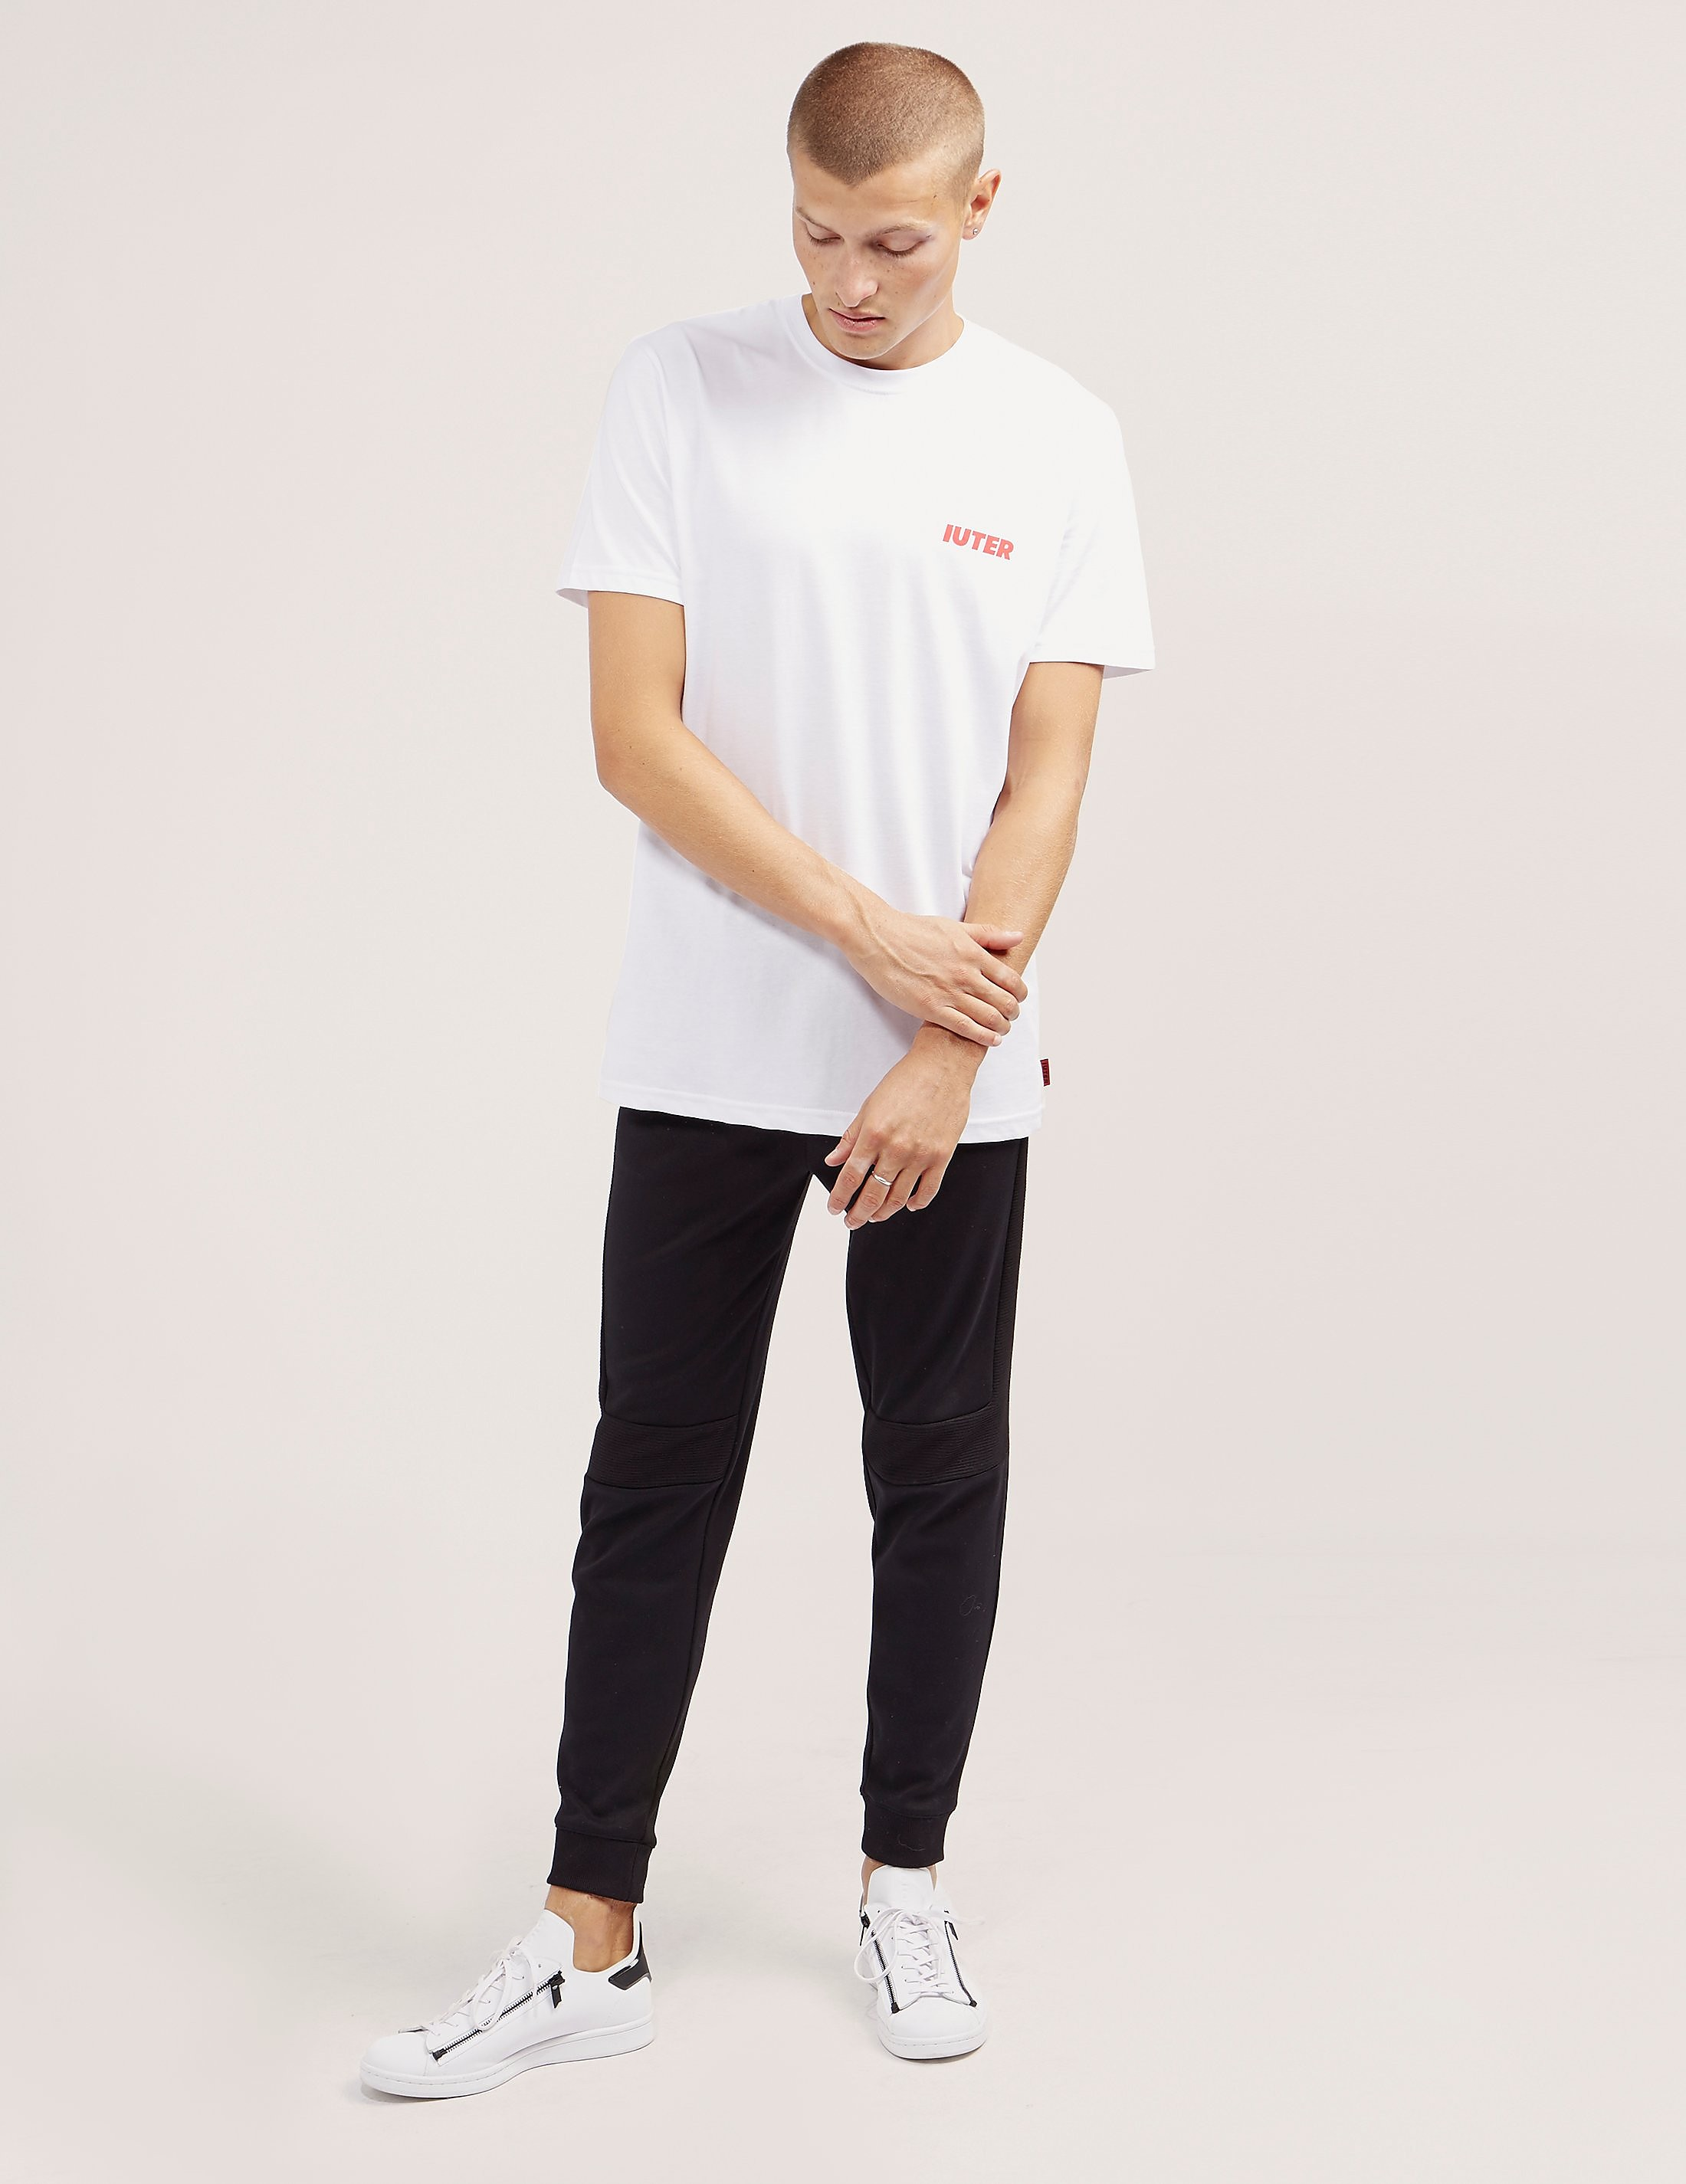 IUTER Wolf Back Short Sleeve T-Shirt - Exclusive